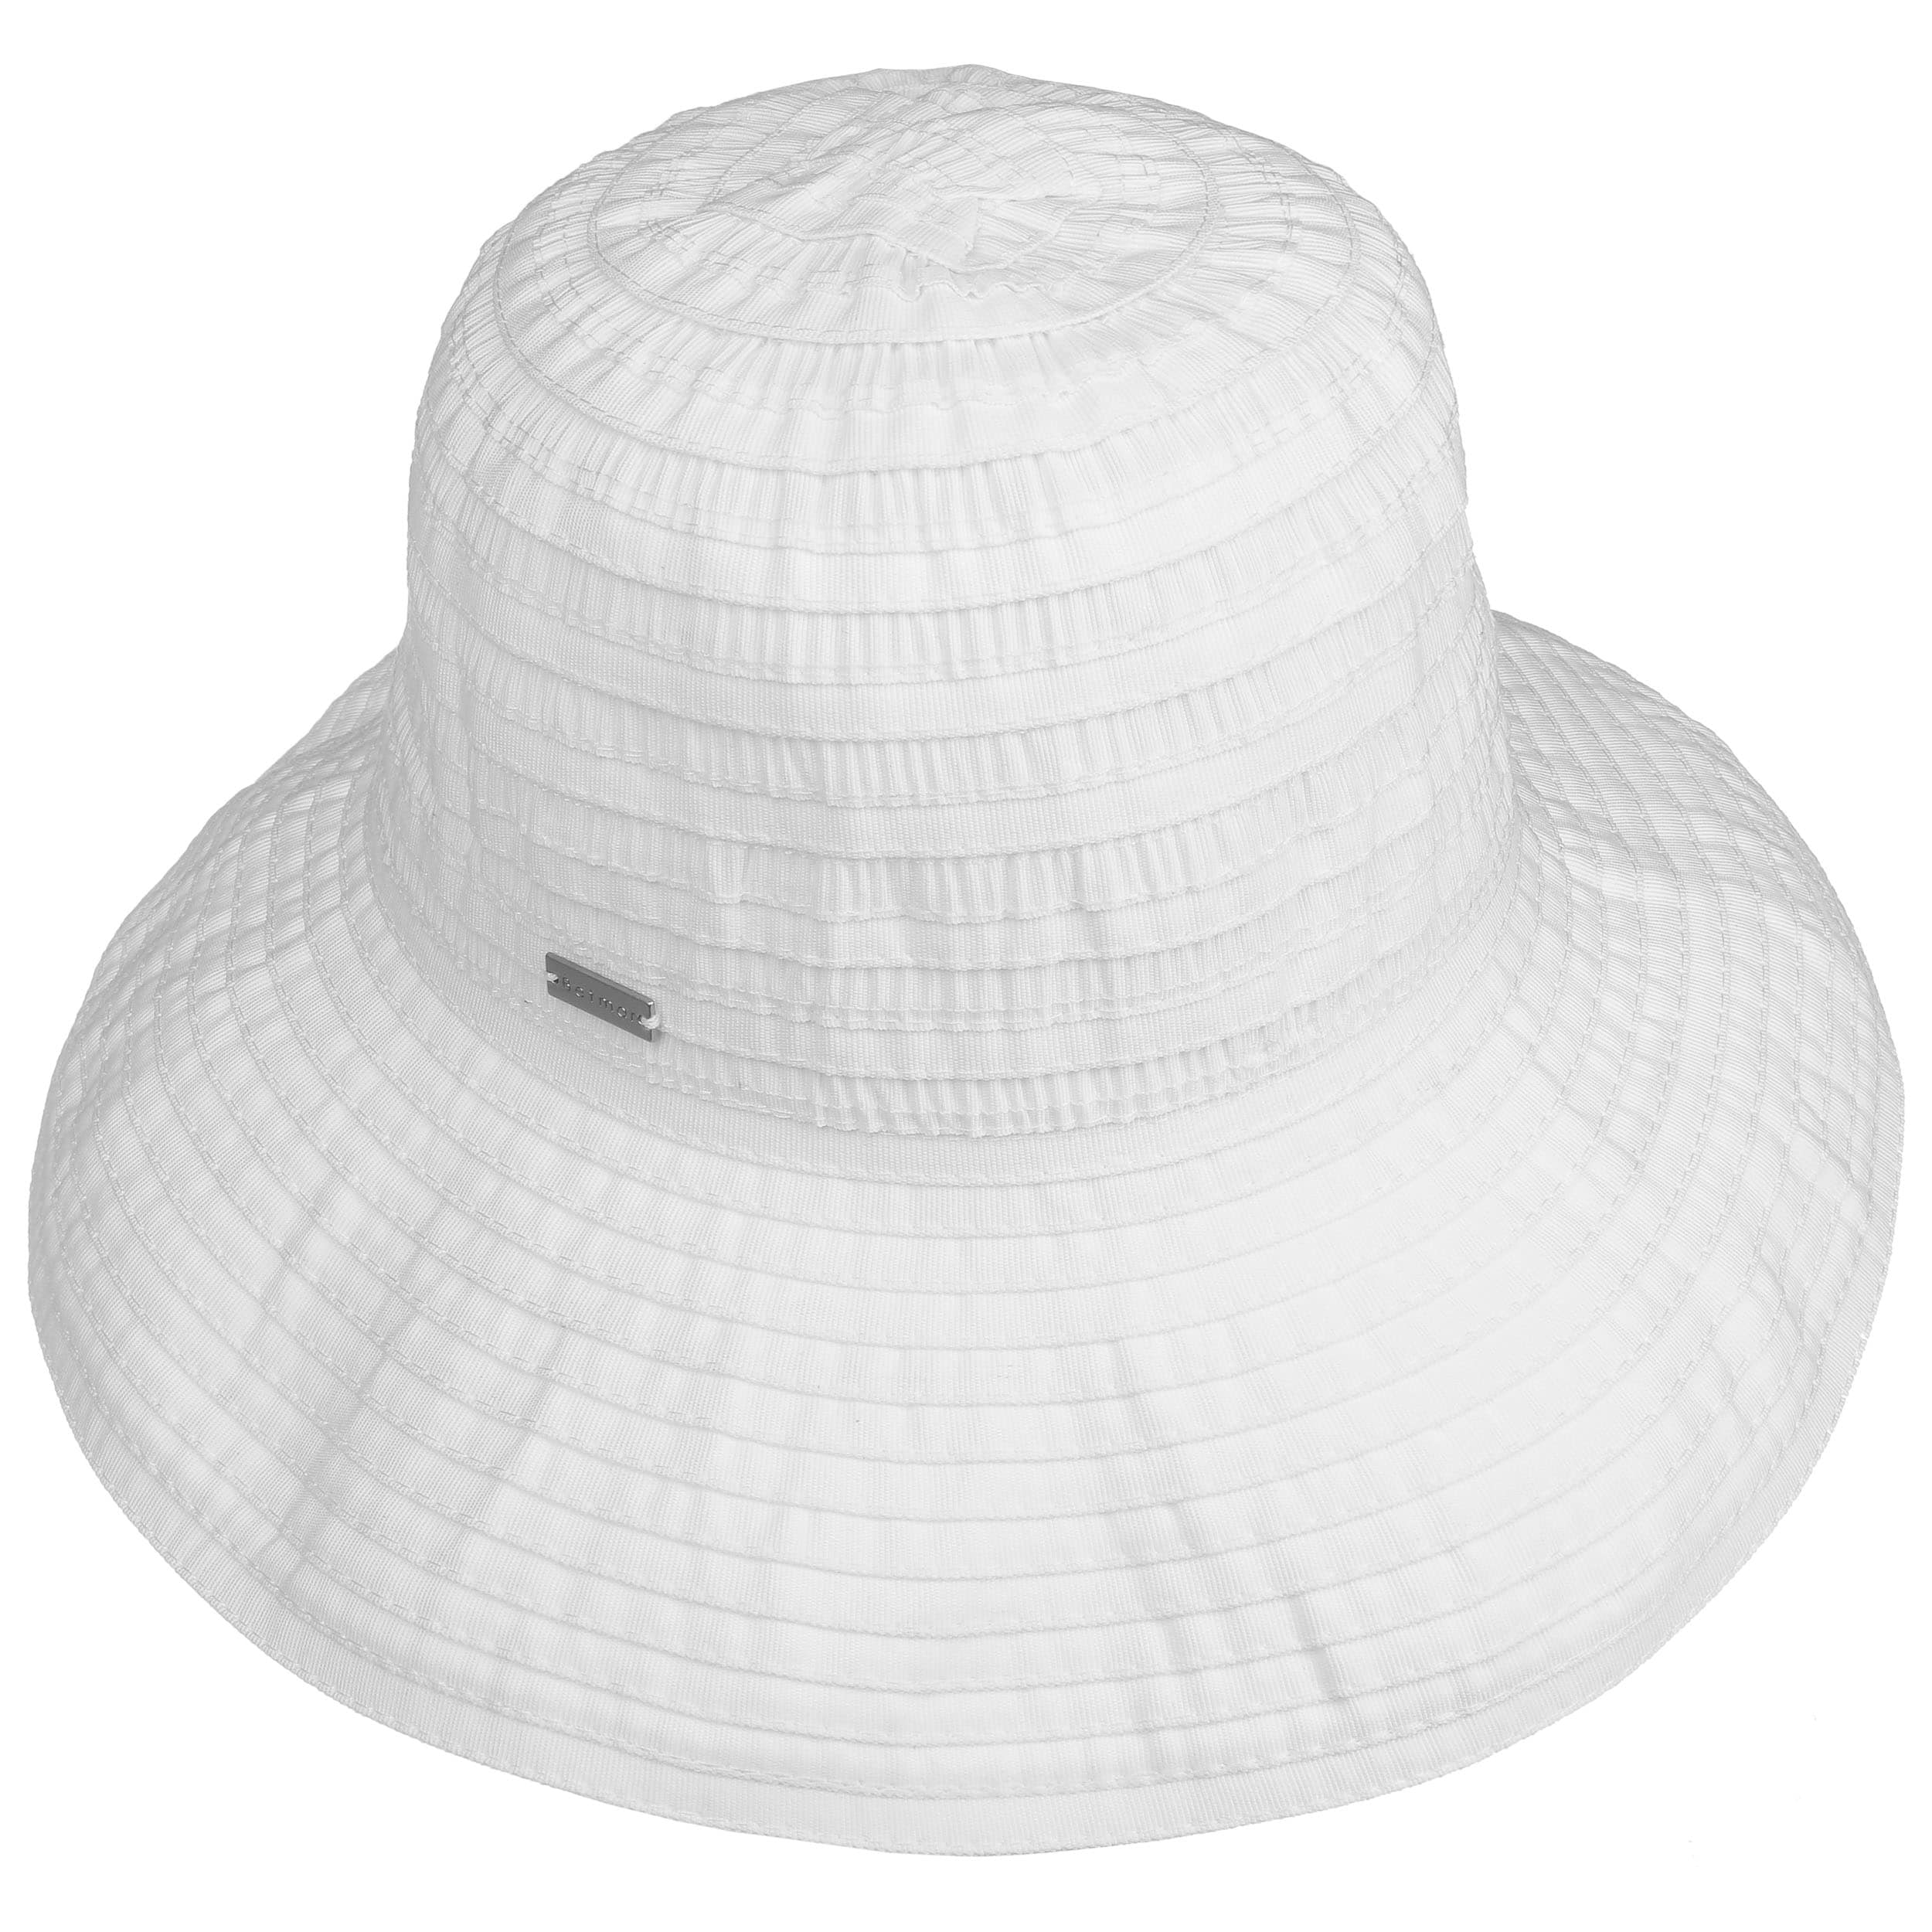 8693cf22653 Classic Sunshade Hut by Betmar - weiß 1 ...